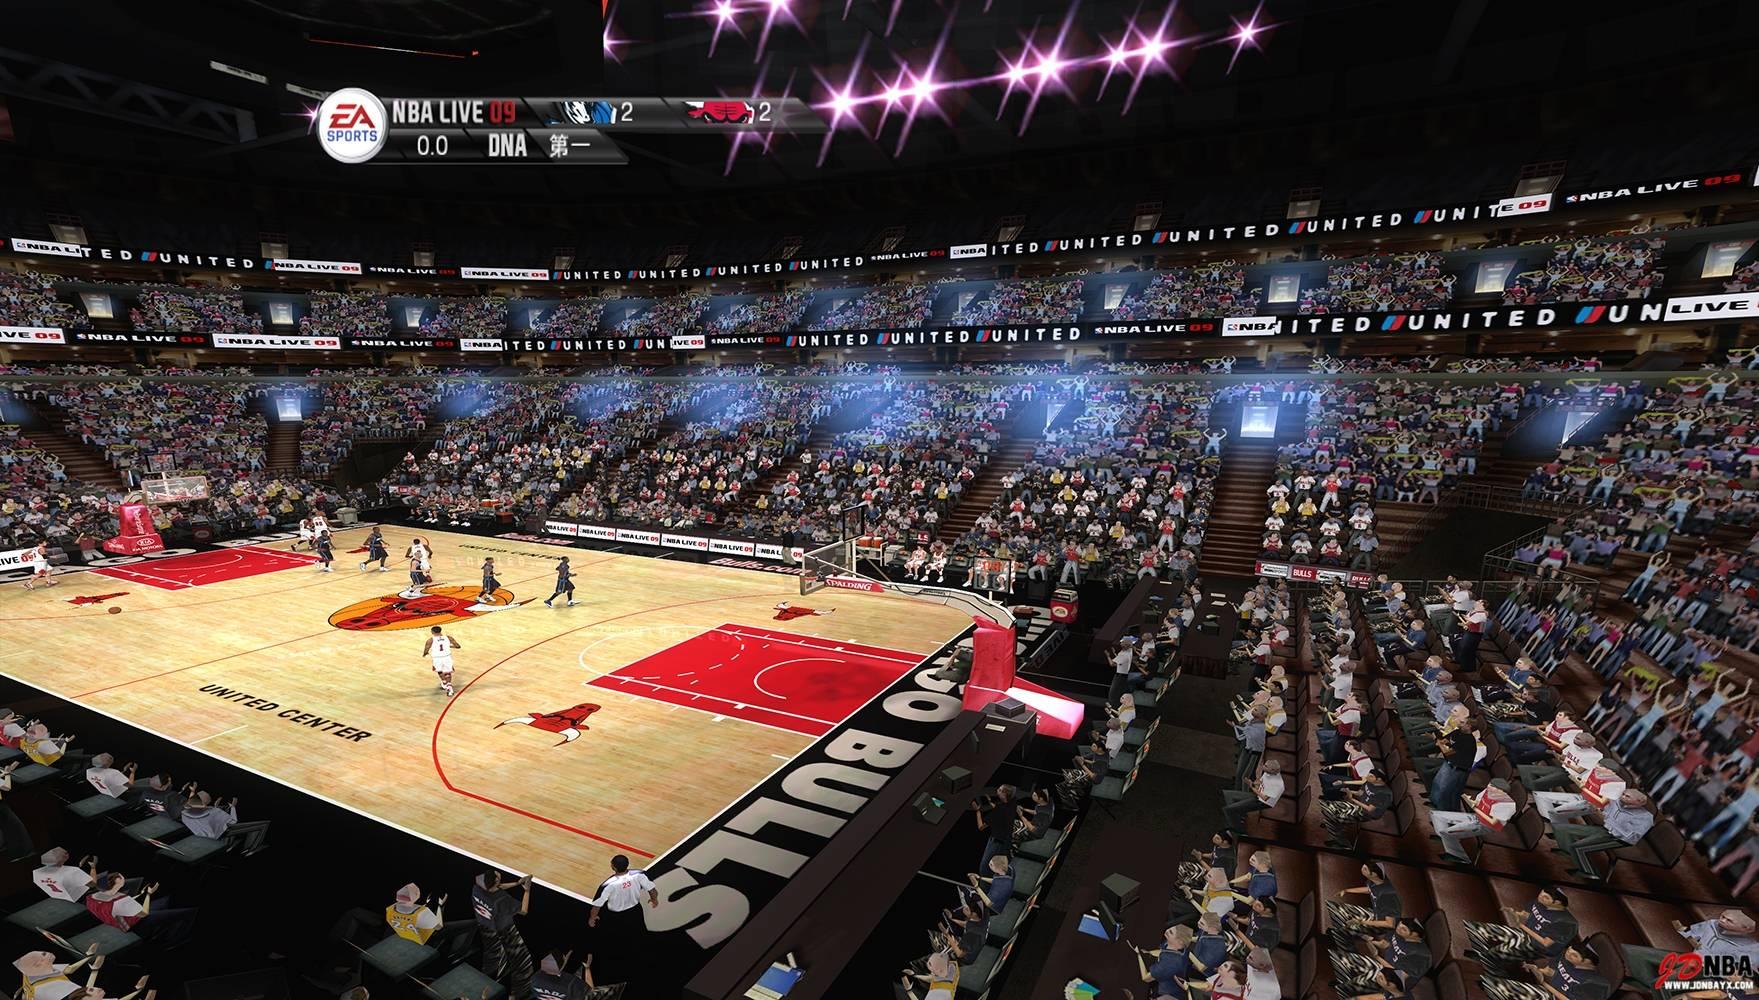 NBA LIVE 09【4K】-2021-07-21-02-11-21-034副本.jpg